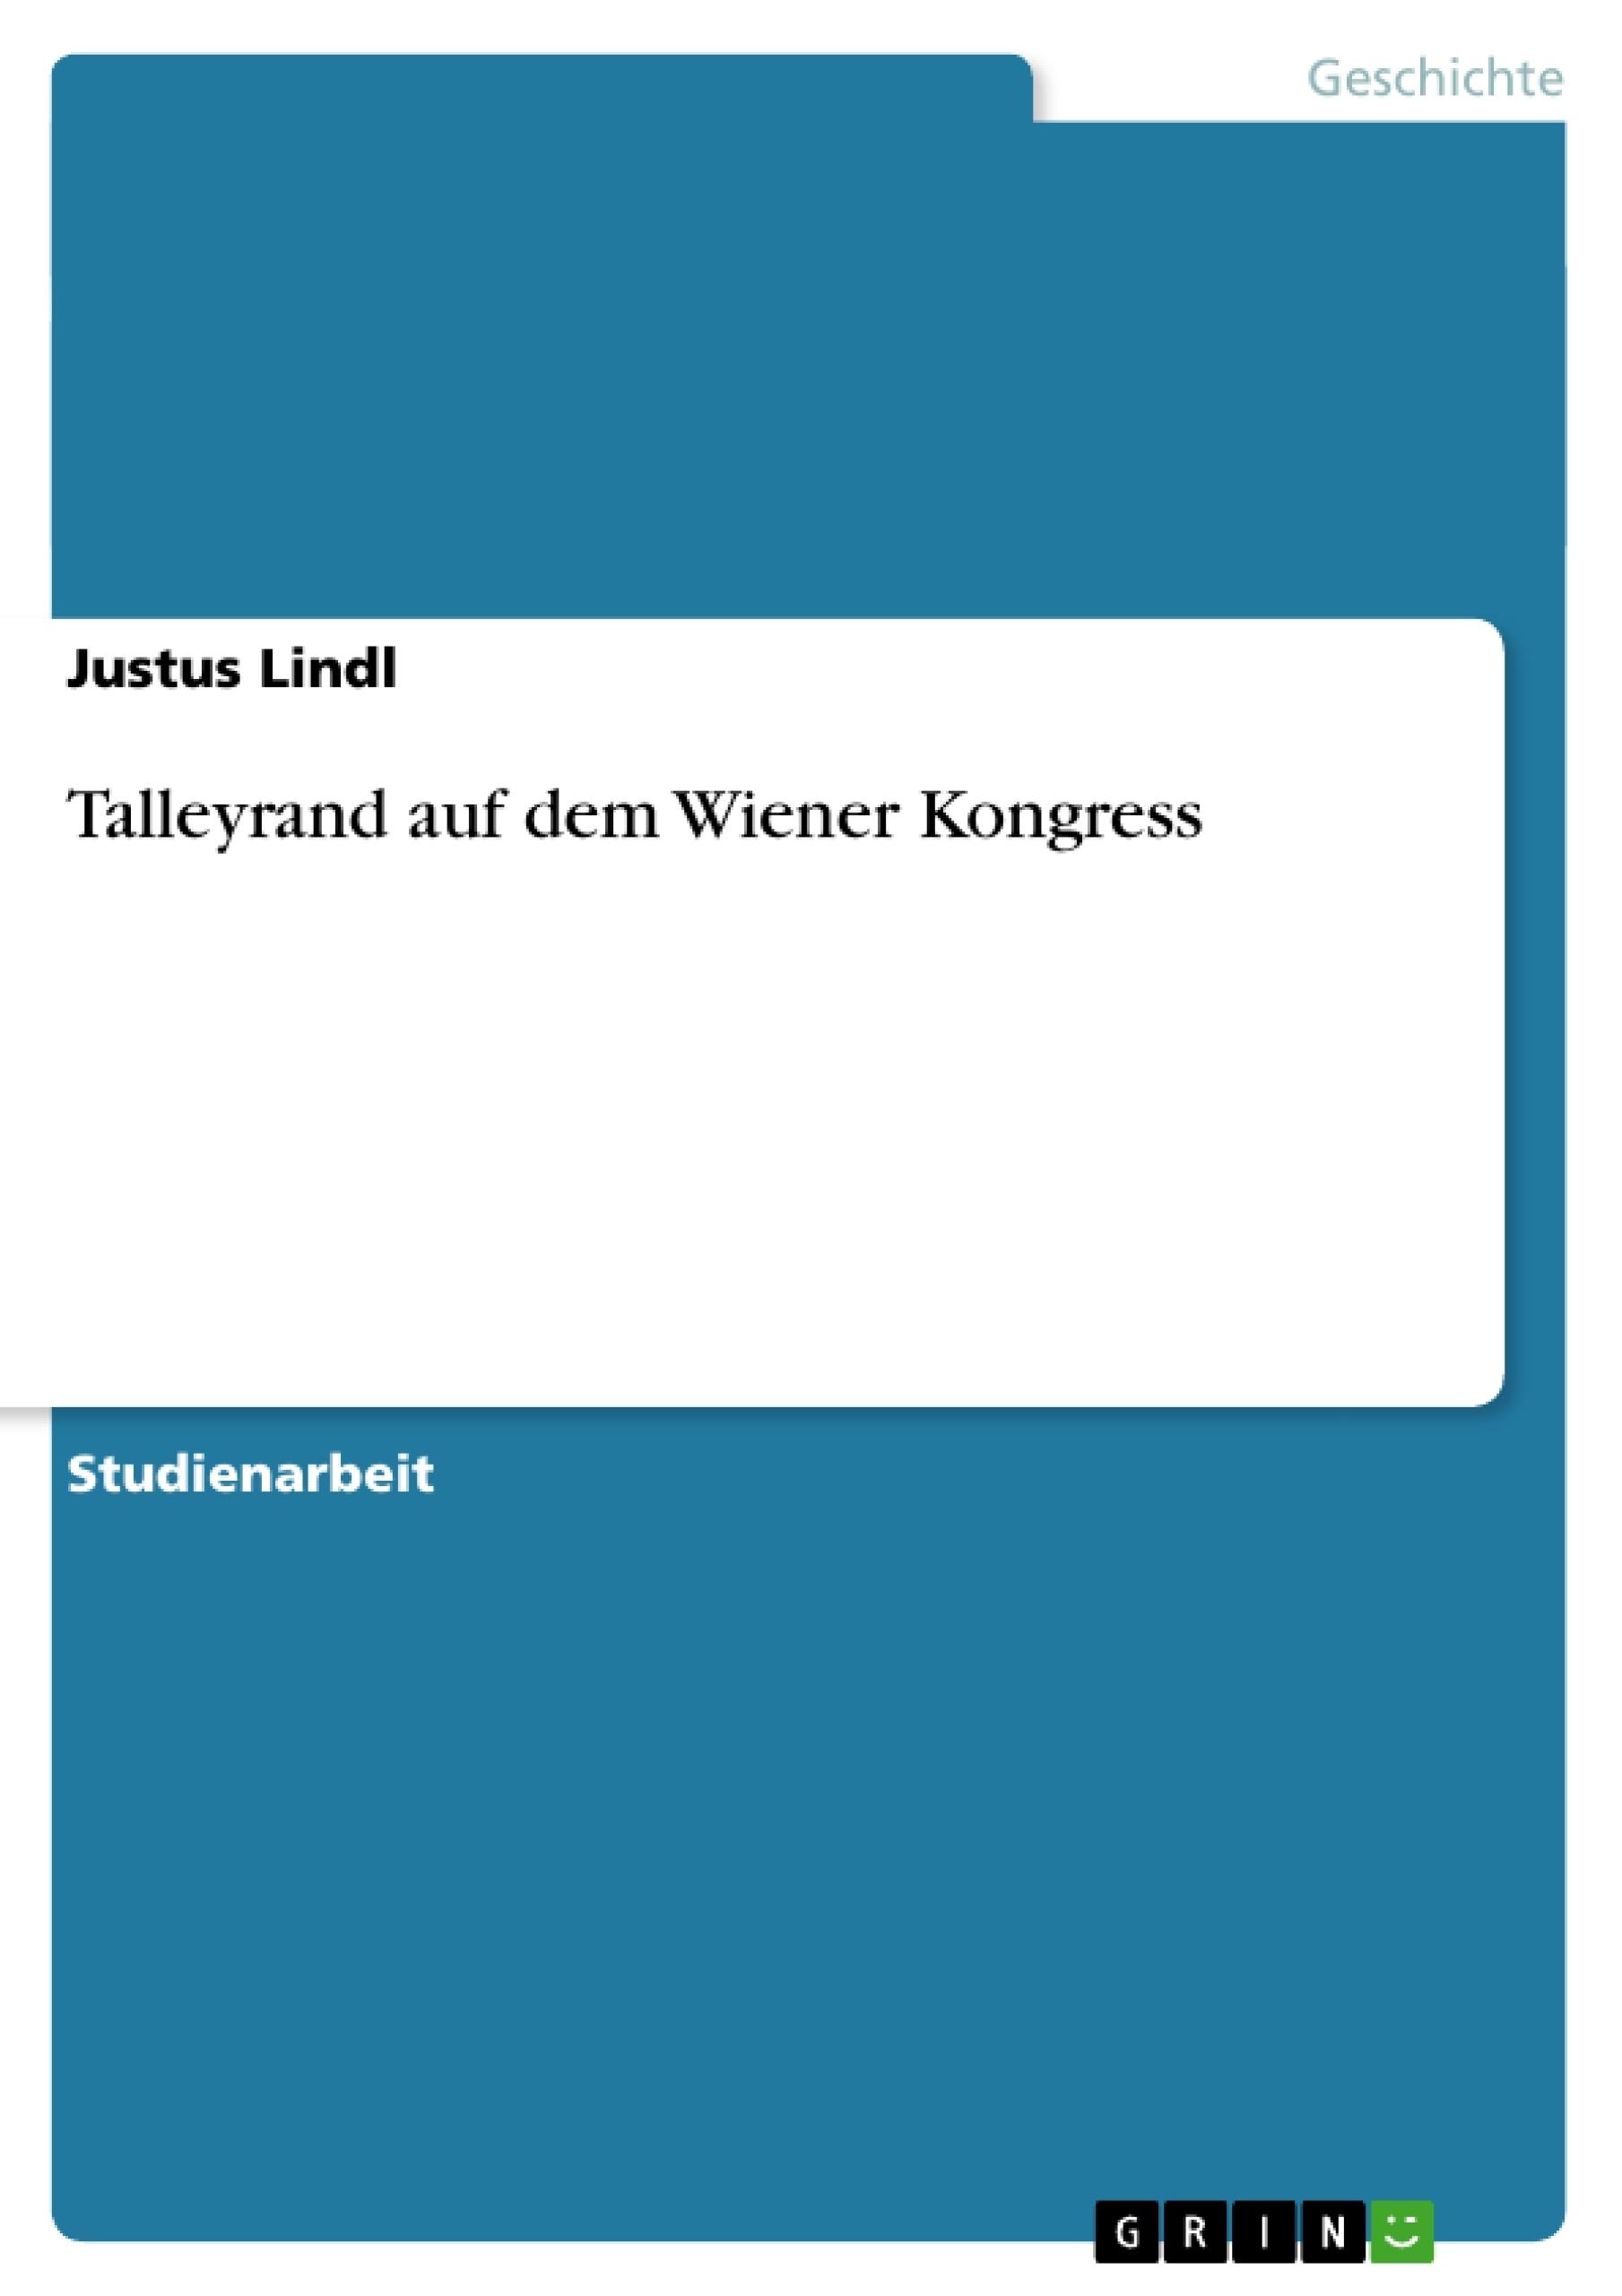 Titel: Talleyrand auf dem Wiener Kongress